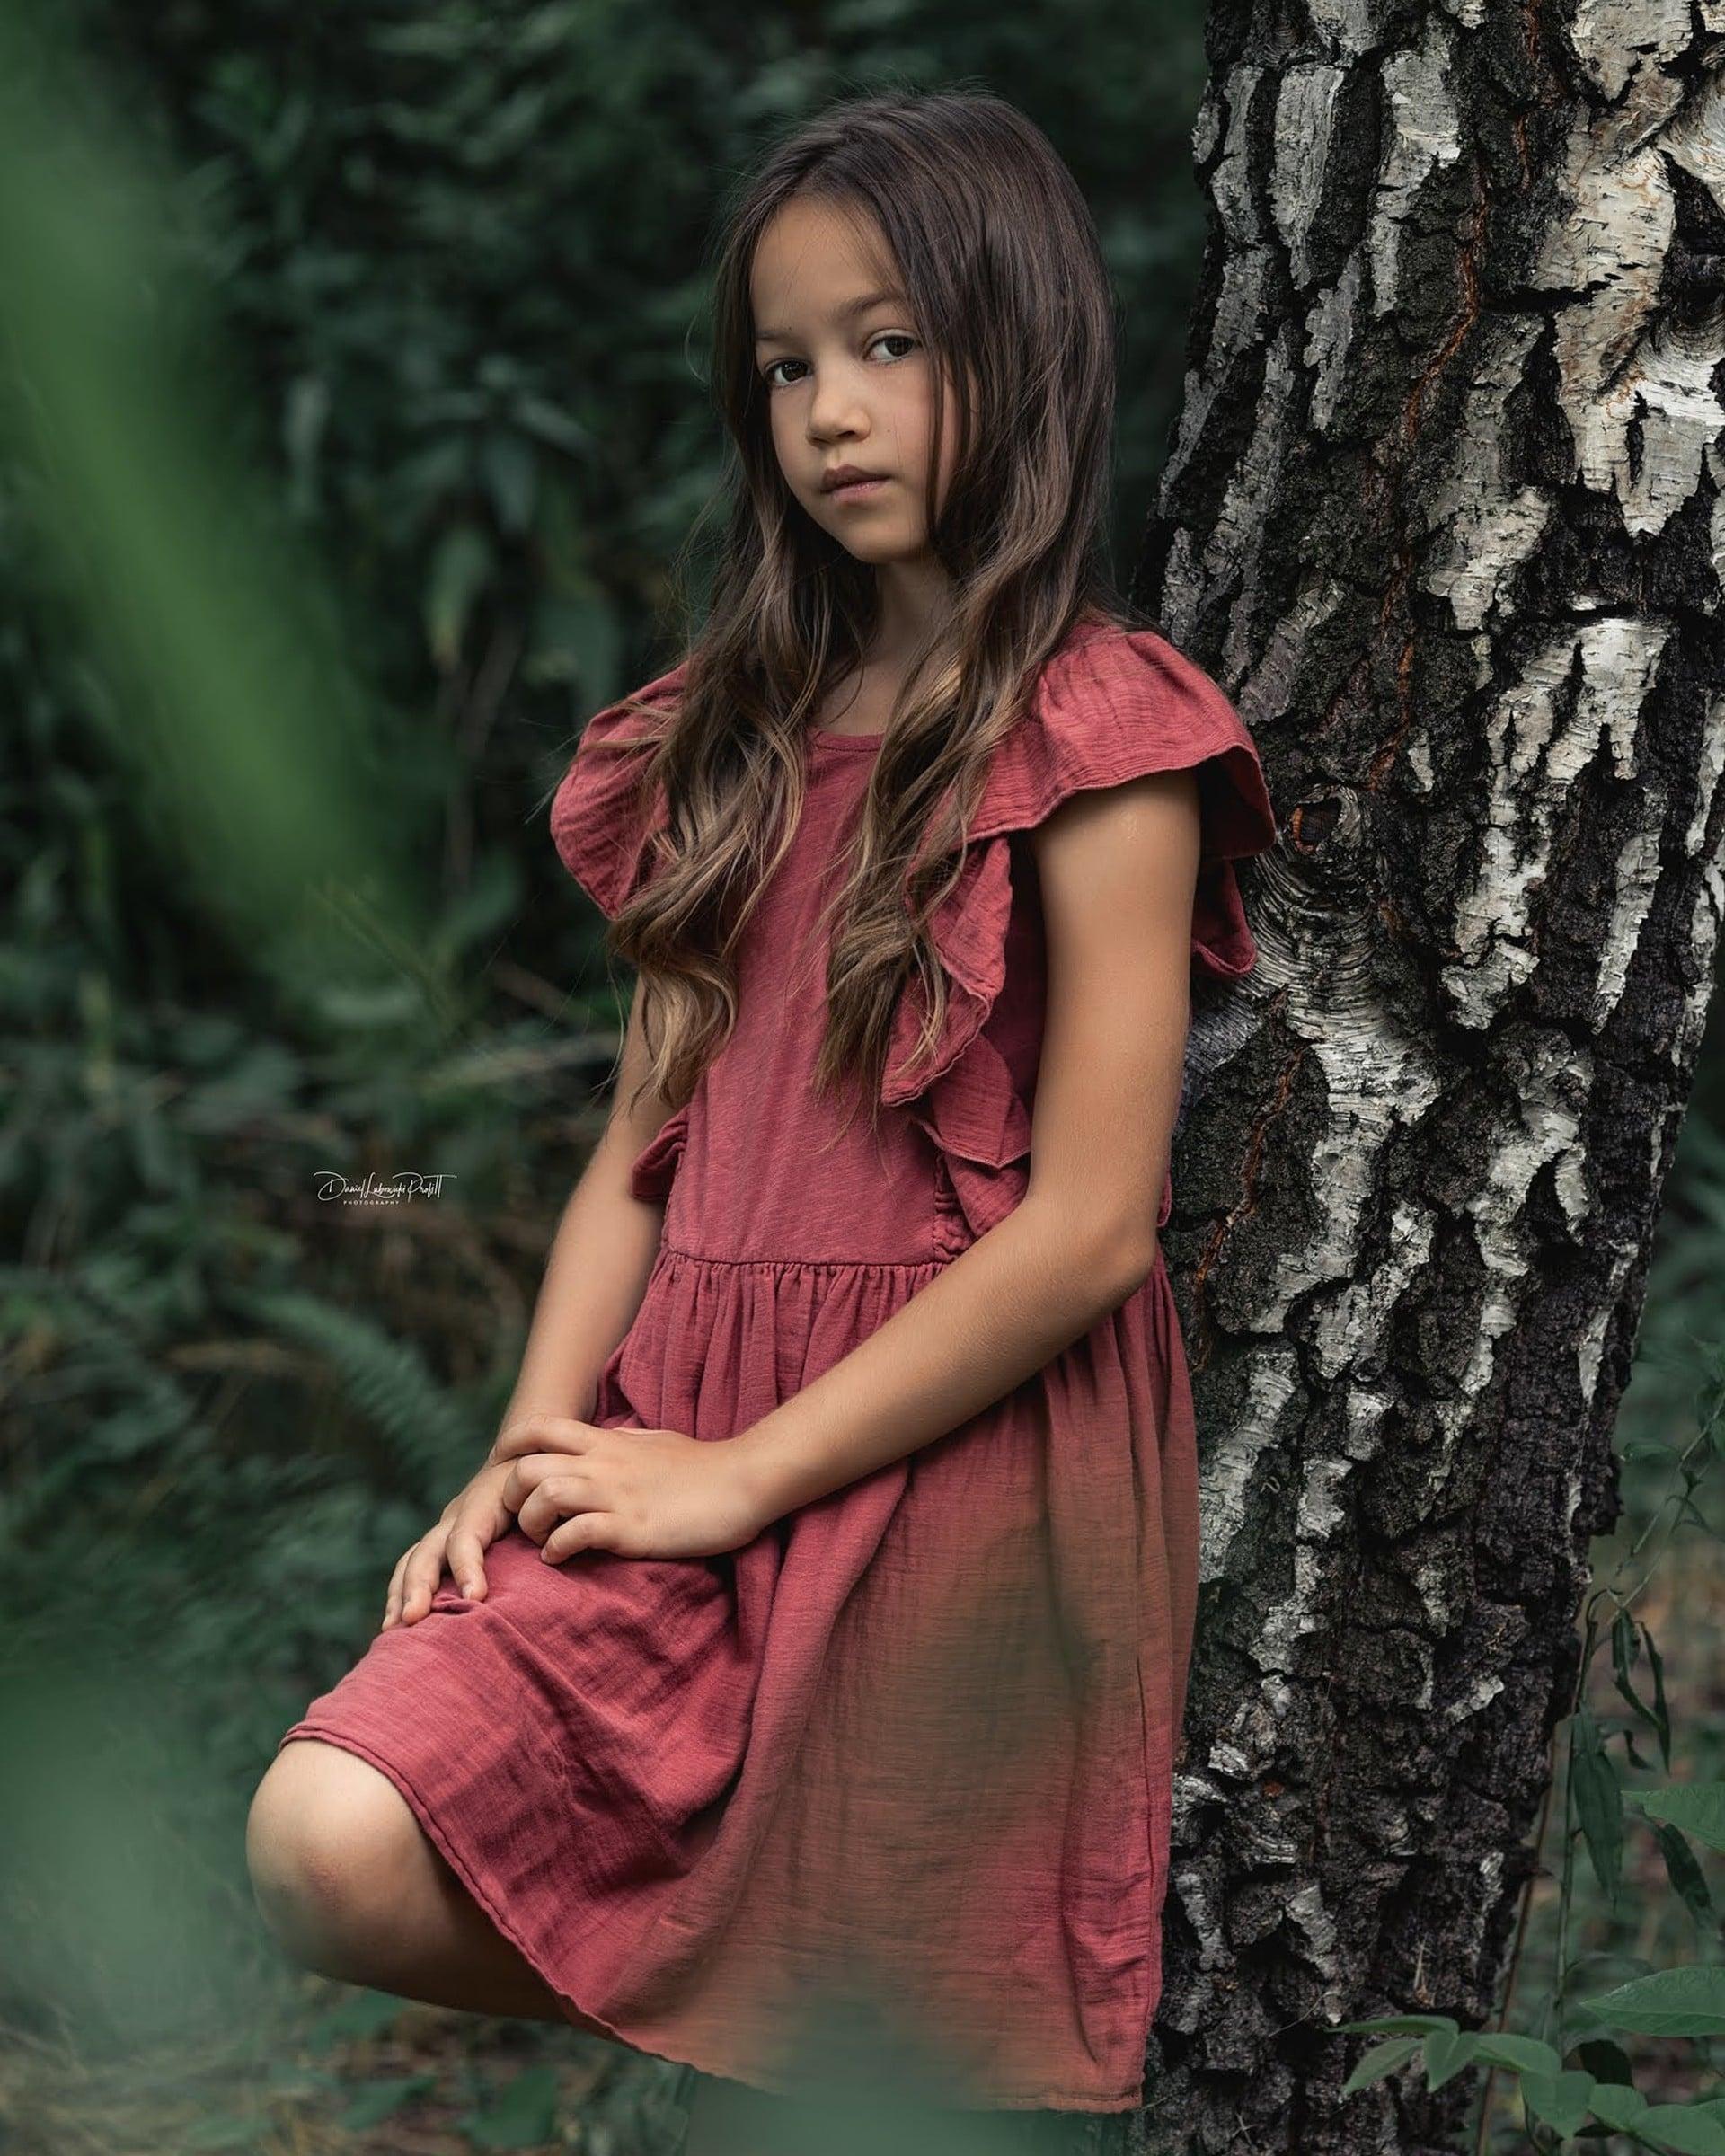 241-Daniel-Sebastian-Lubowicki-Kinderbilder-pmUbxXfg